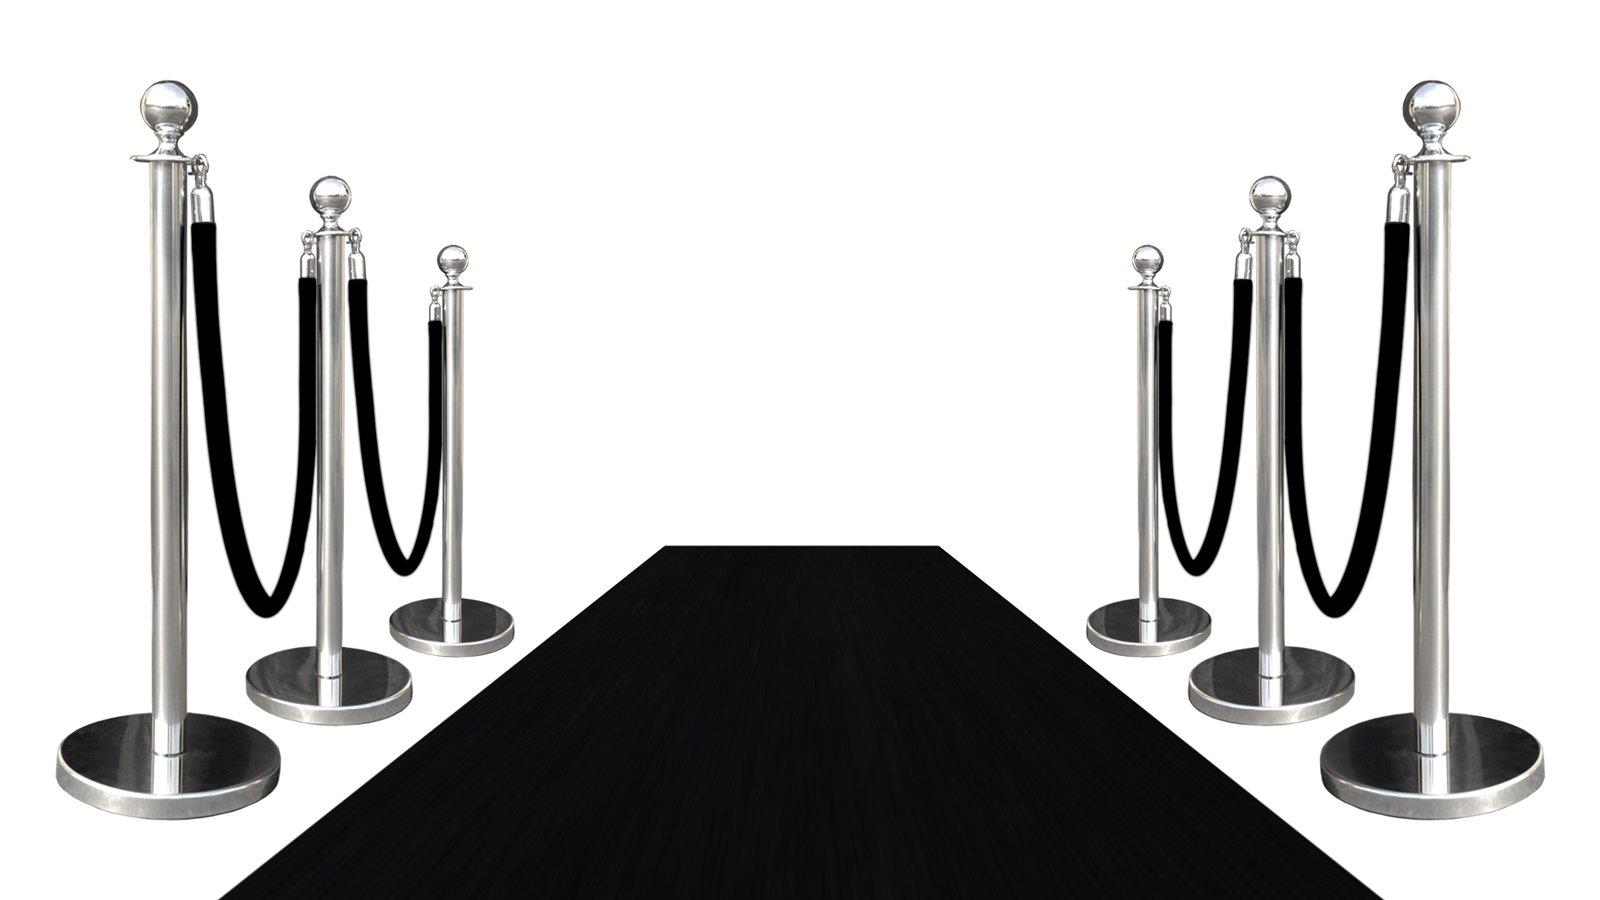 VIP BLACK CARPET COMBO SPECIAL (PKG INC 6-MIRROR POSTS + 4-ROPES + 1-3'X10' BLACK CARPET)